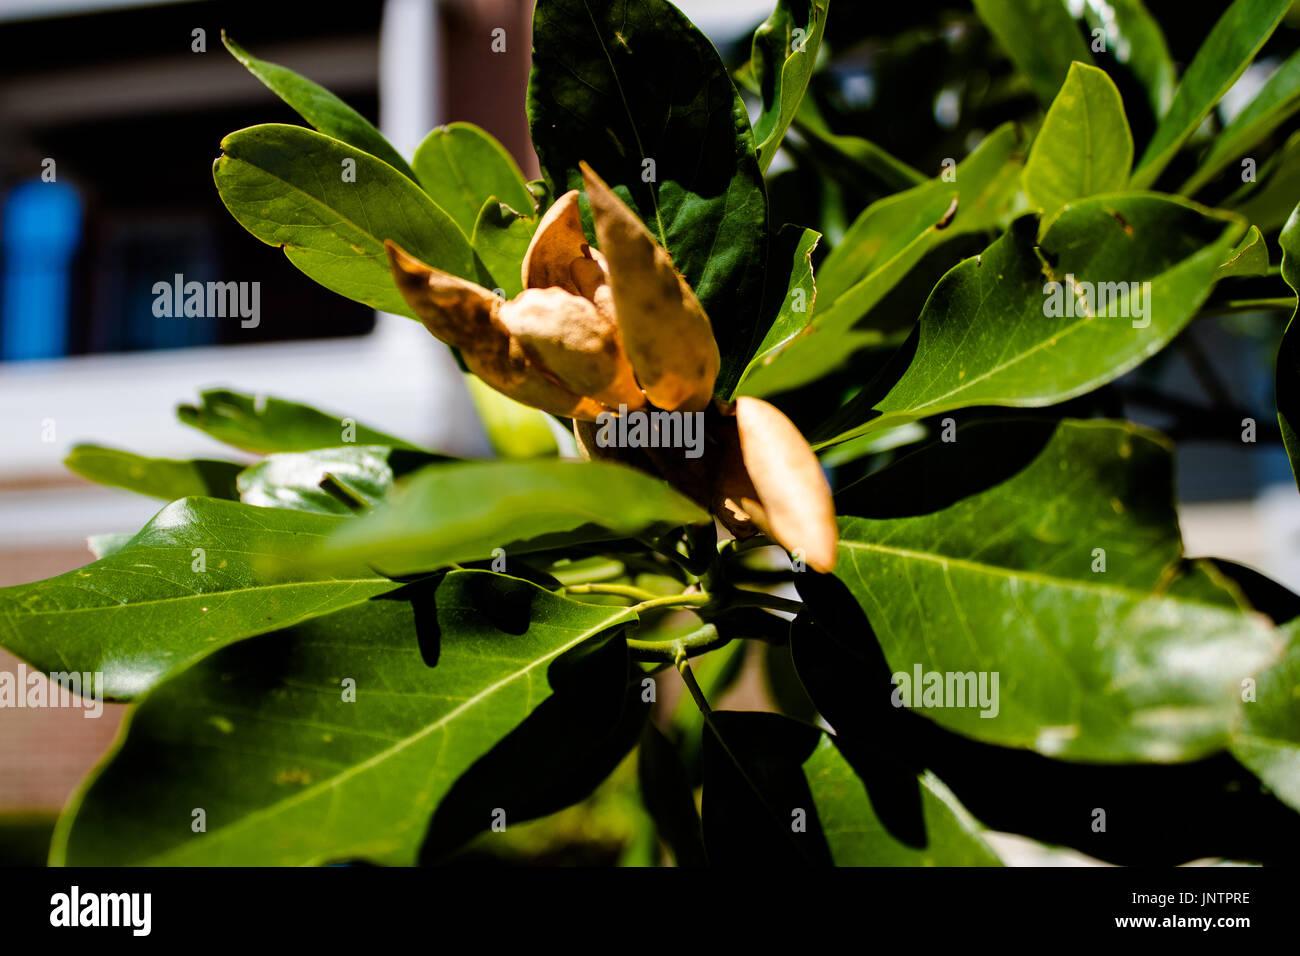 Off Dry Stockfotos & Off Dry Bilder - Seite 38 - Alamy